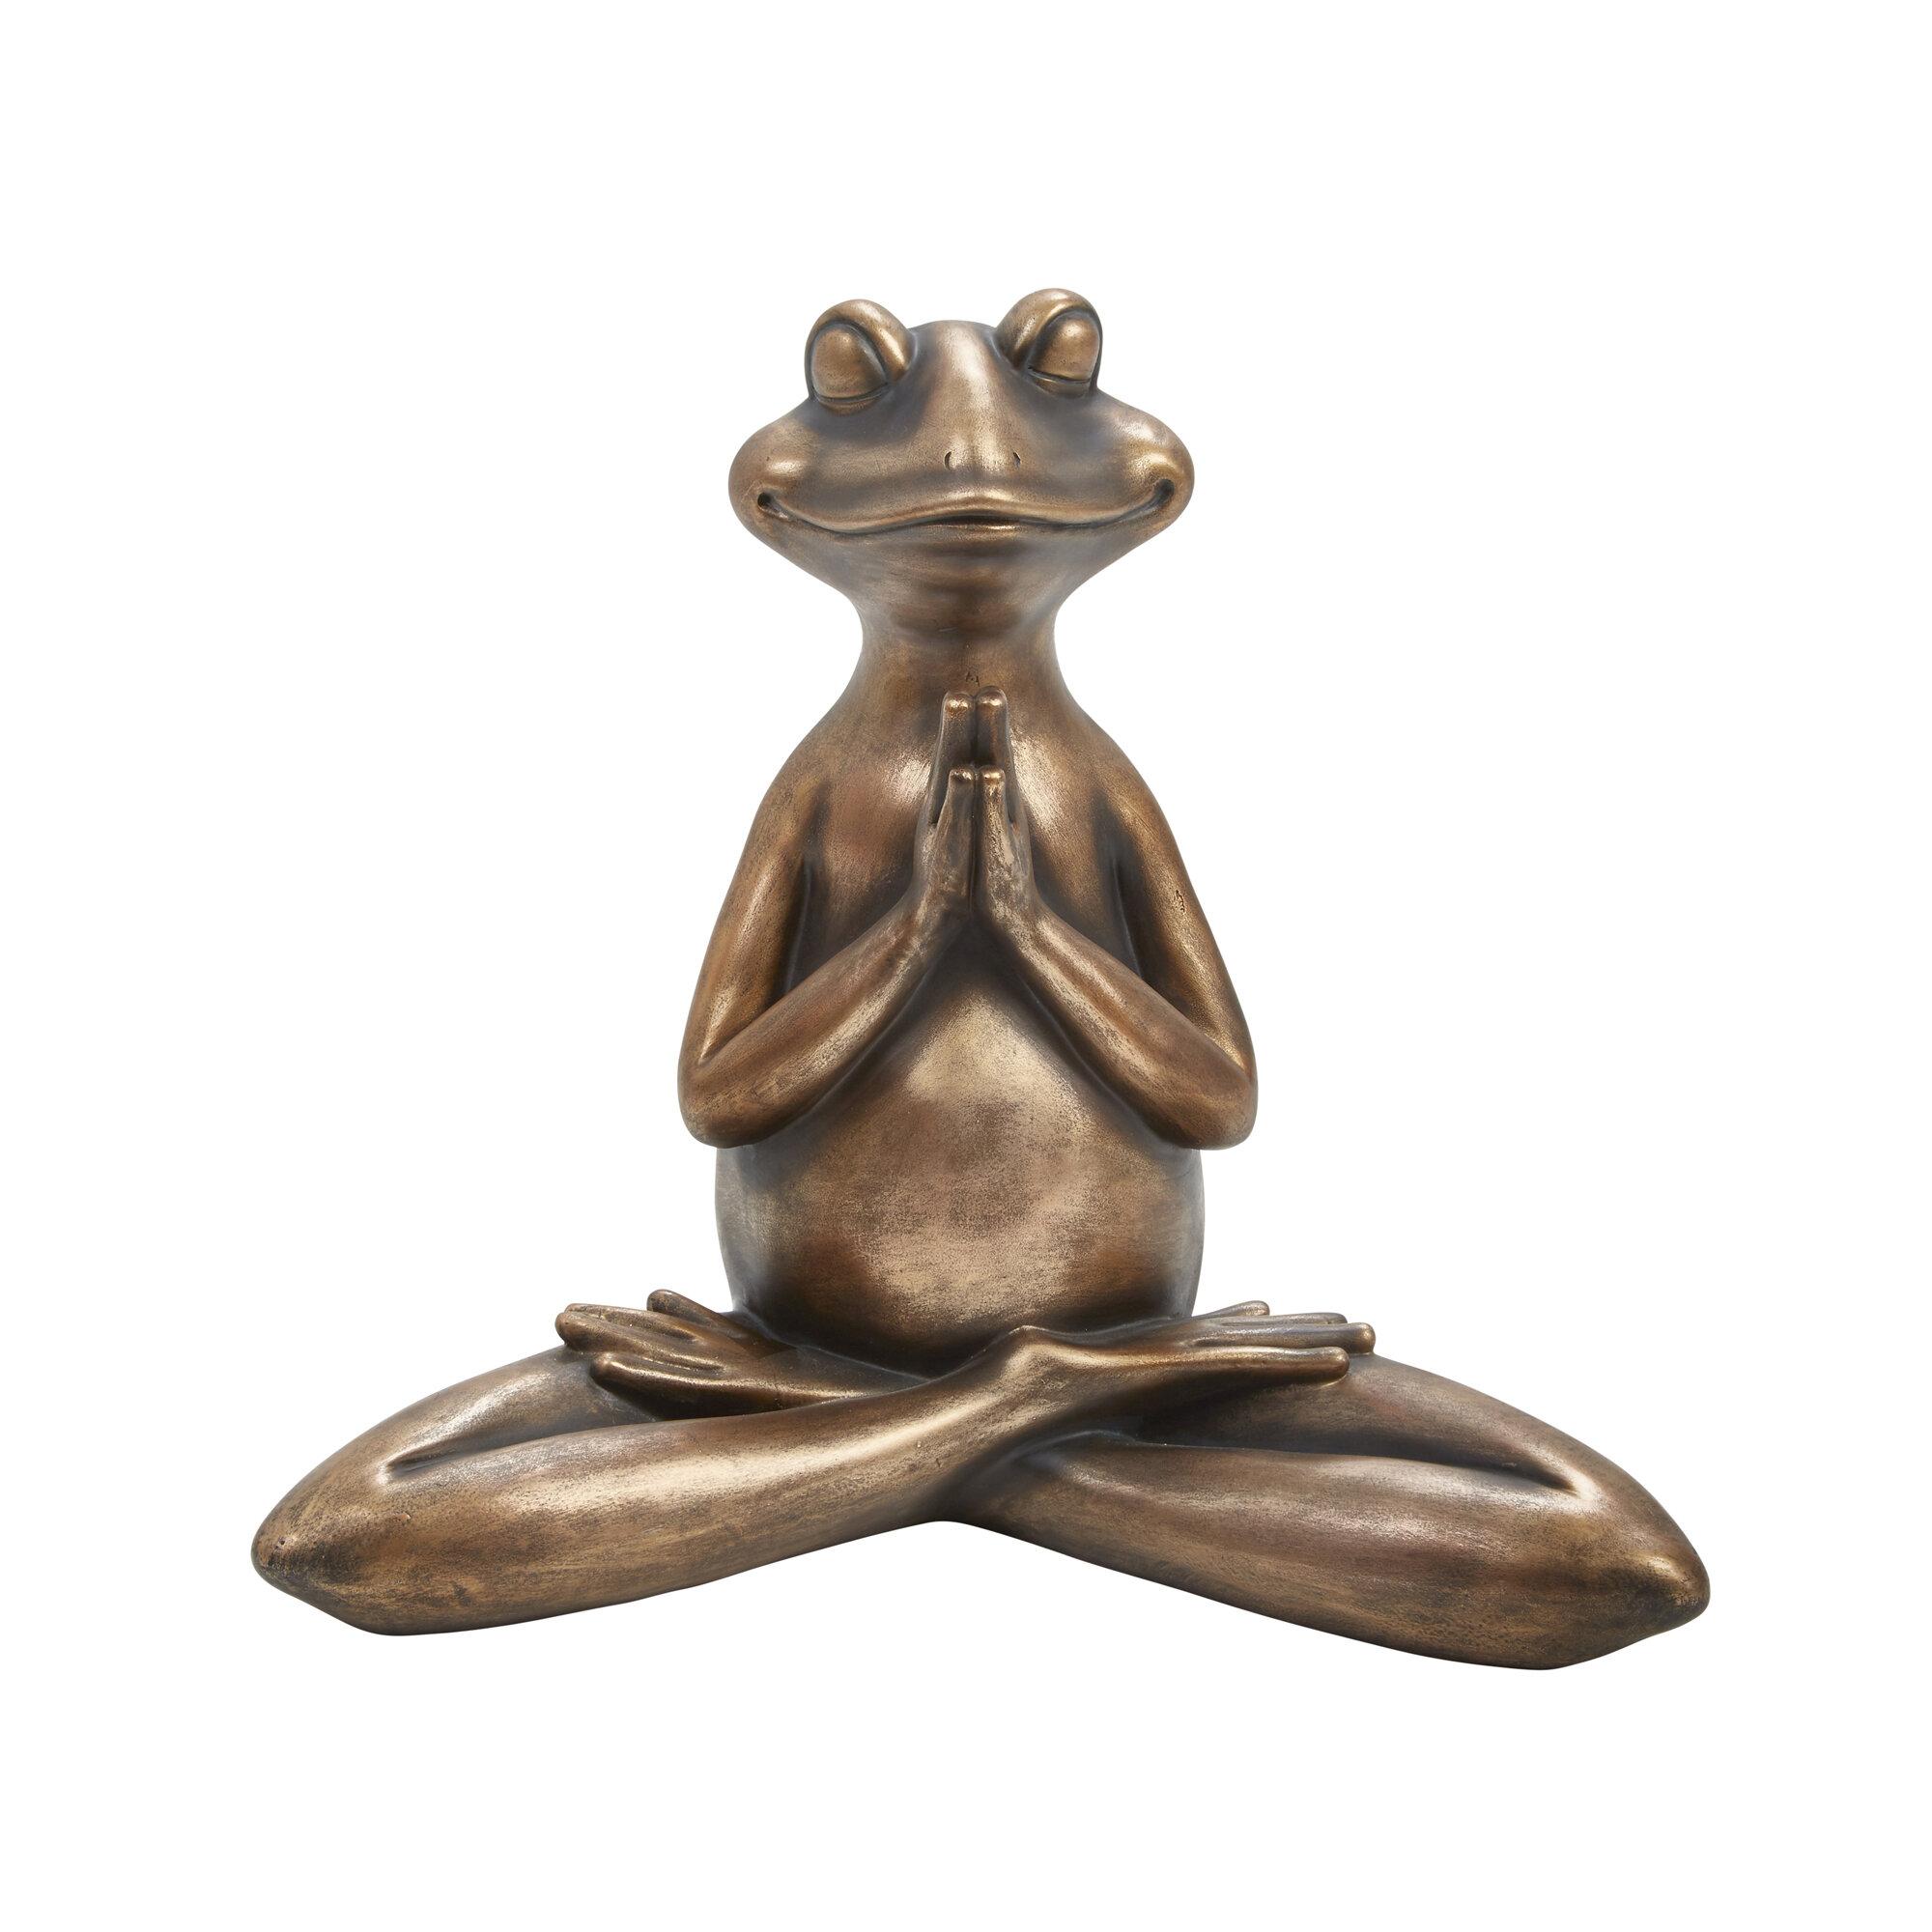 WOLF Blackened Bronze Handmade Figurine SALE!!